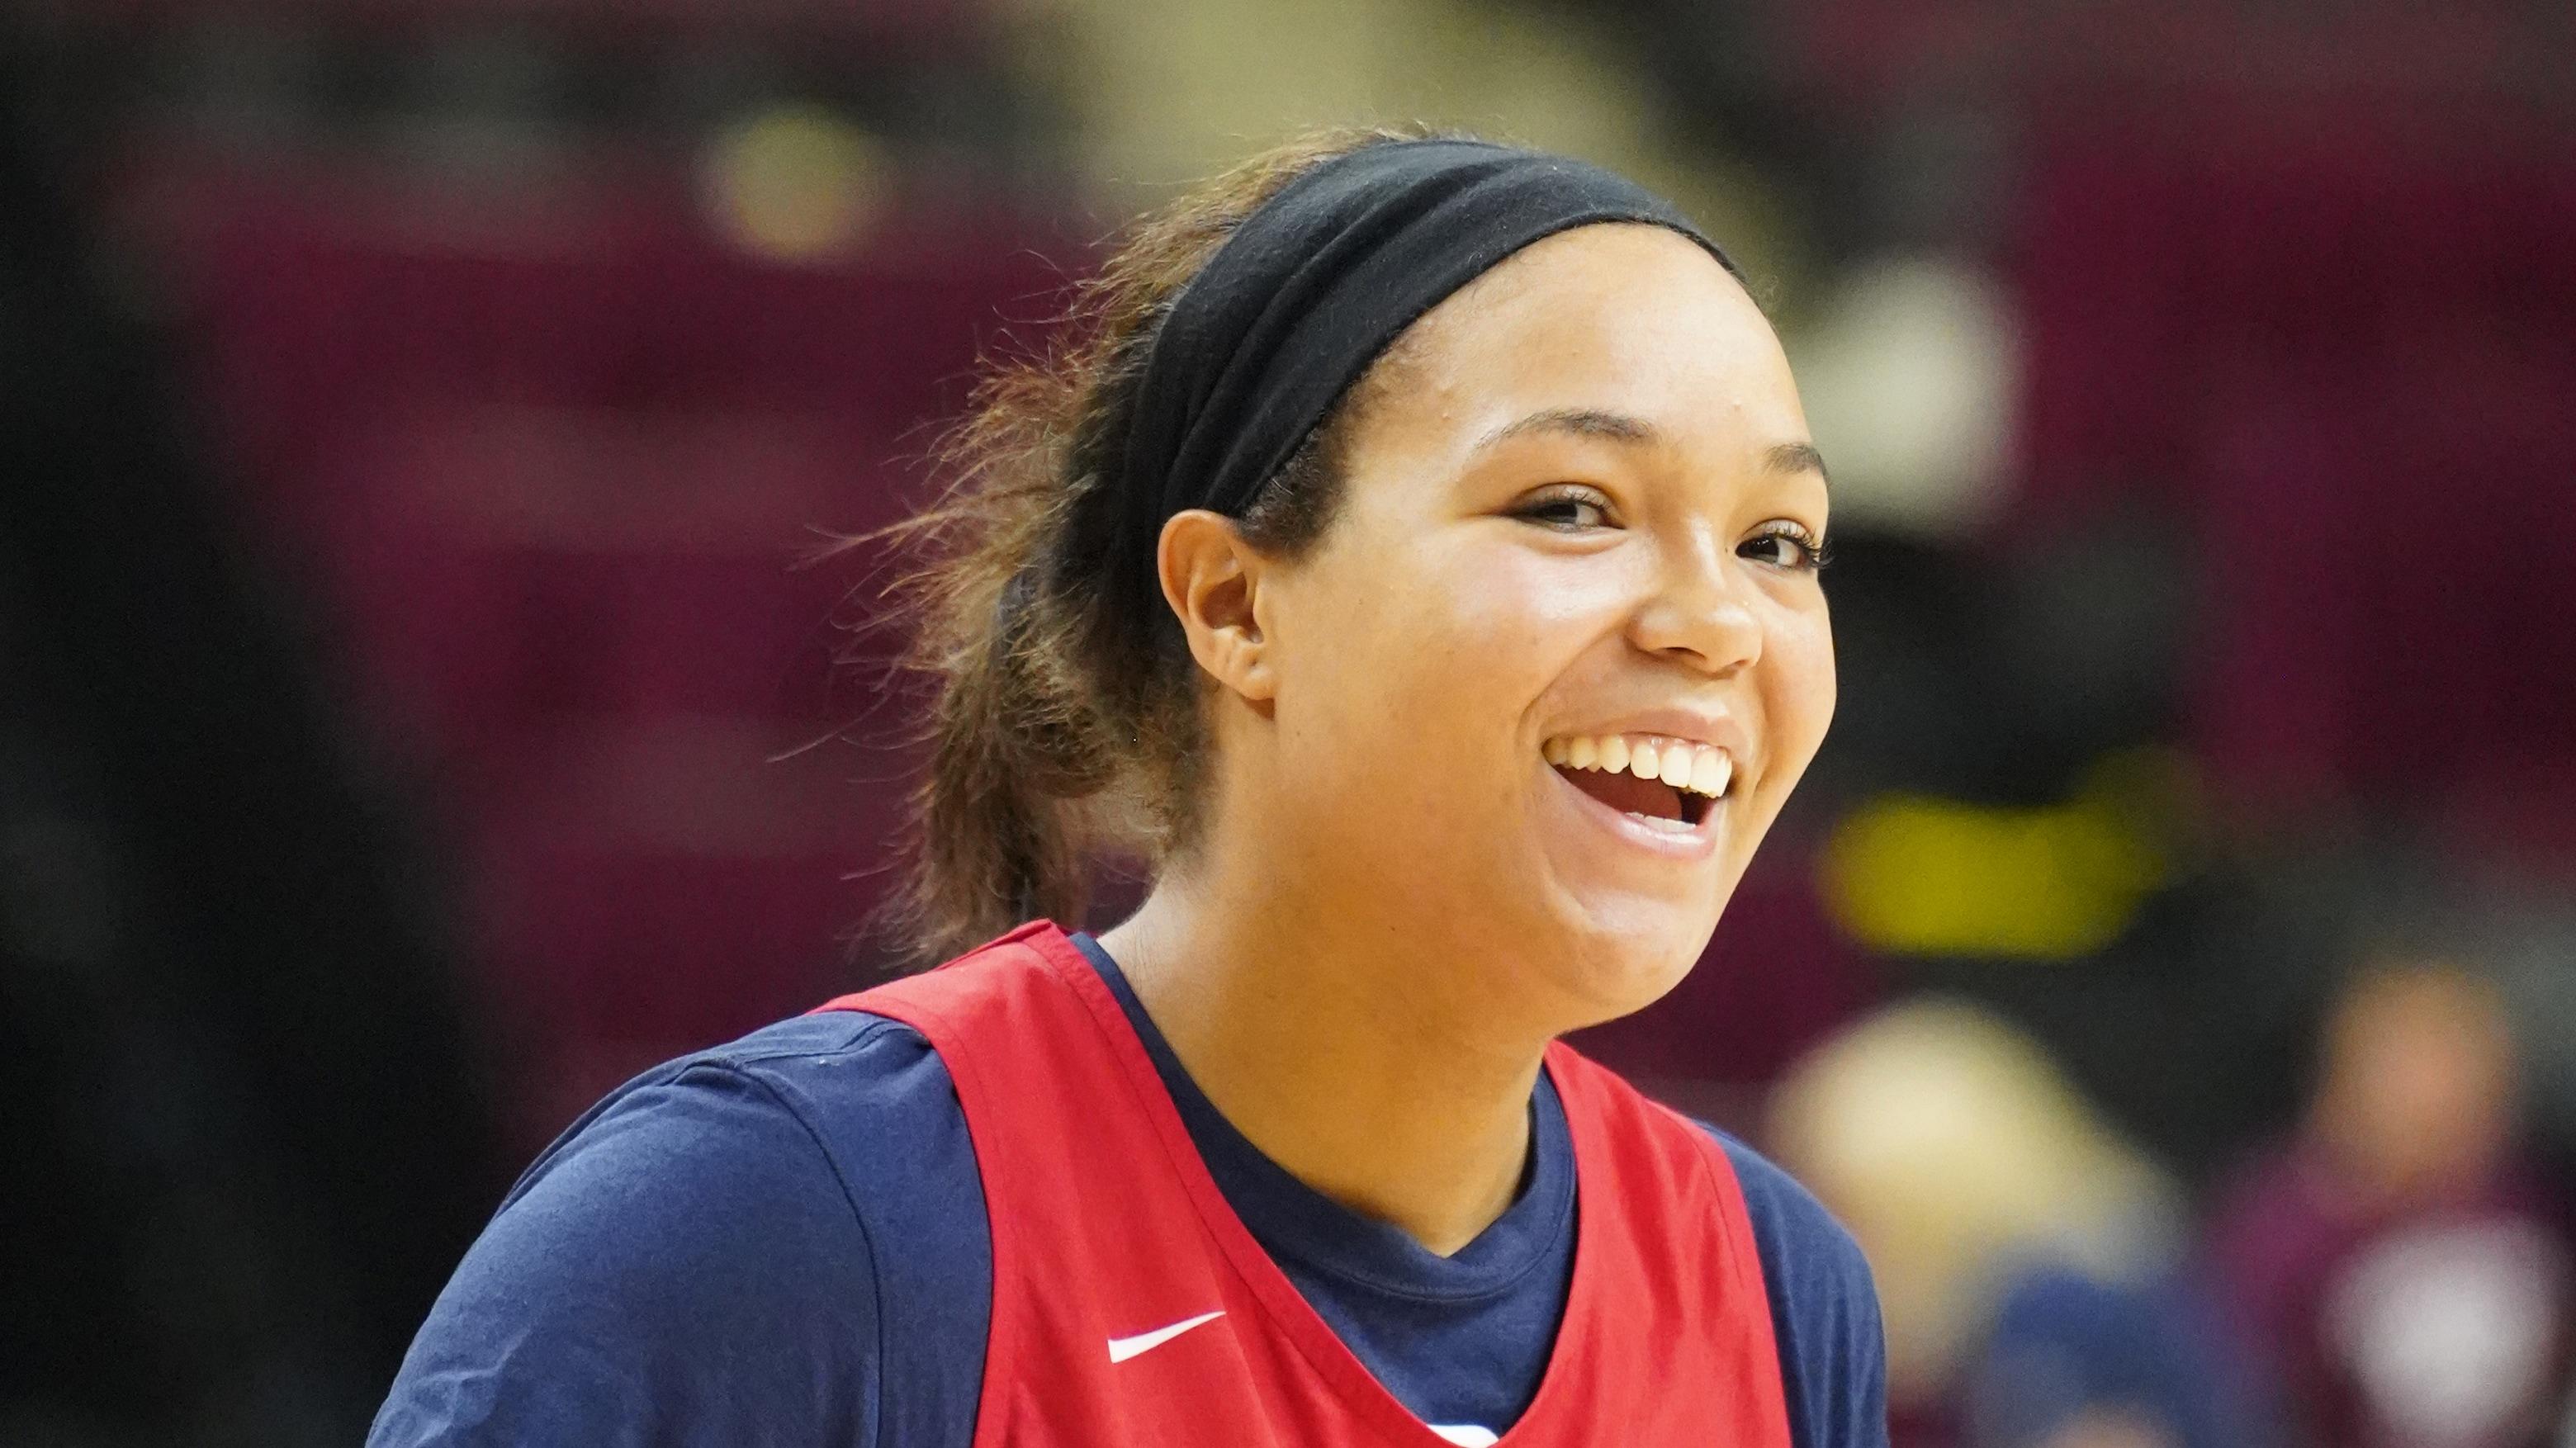 USAB Practice Ahead of Texas A&M Game - WNBA.com - Official Site of the WNBA